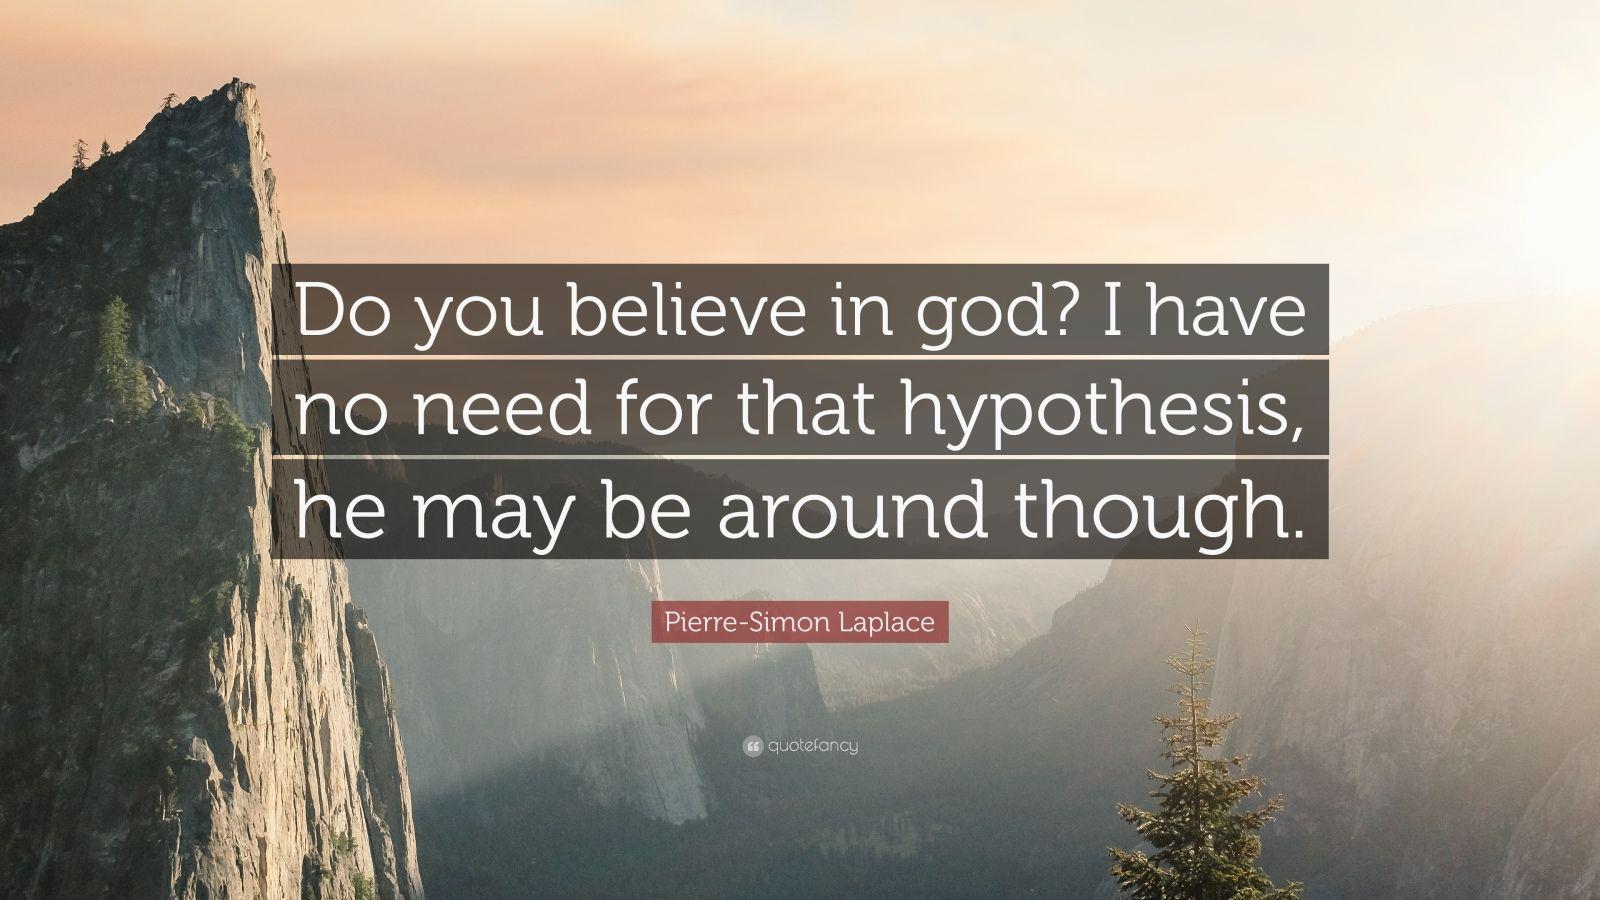 Do you believe in god essay